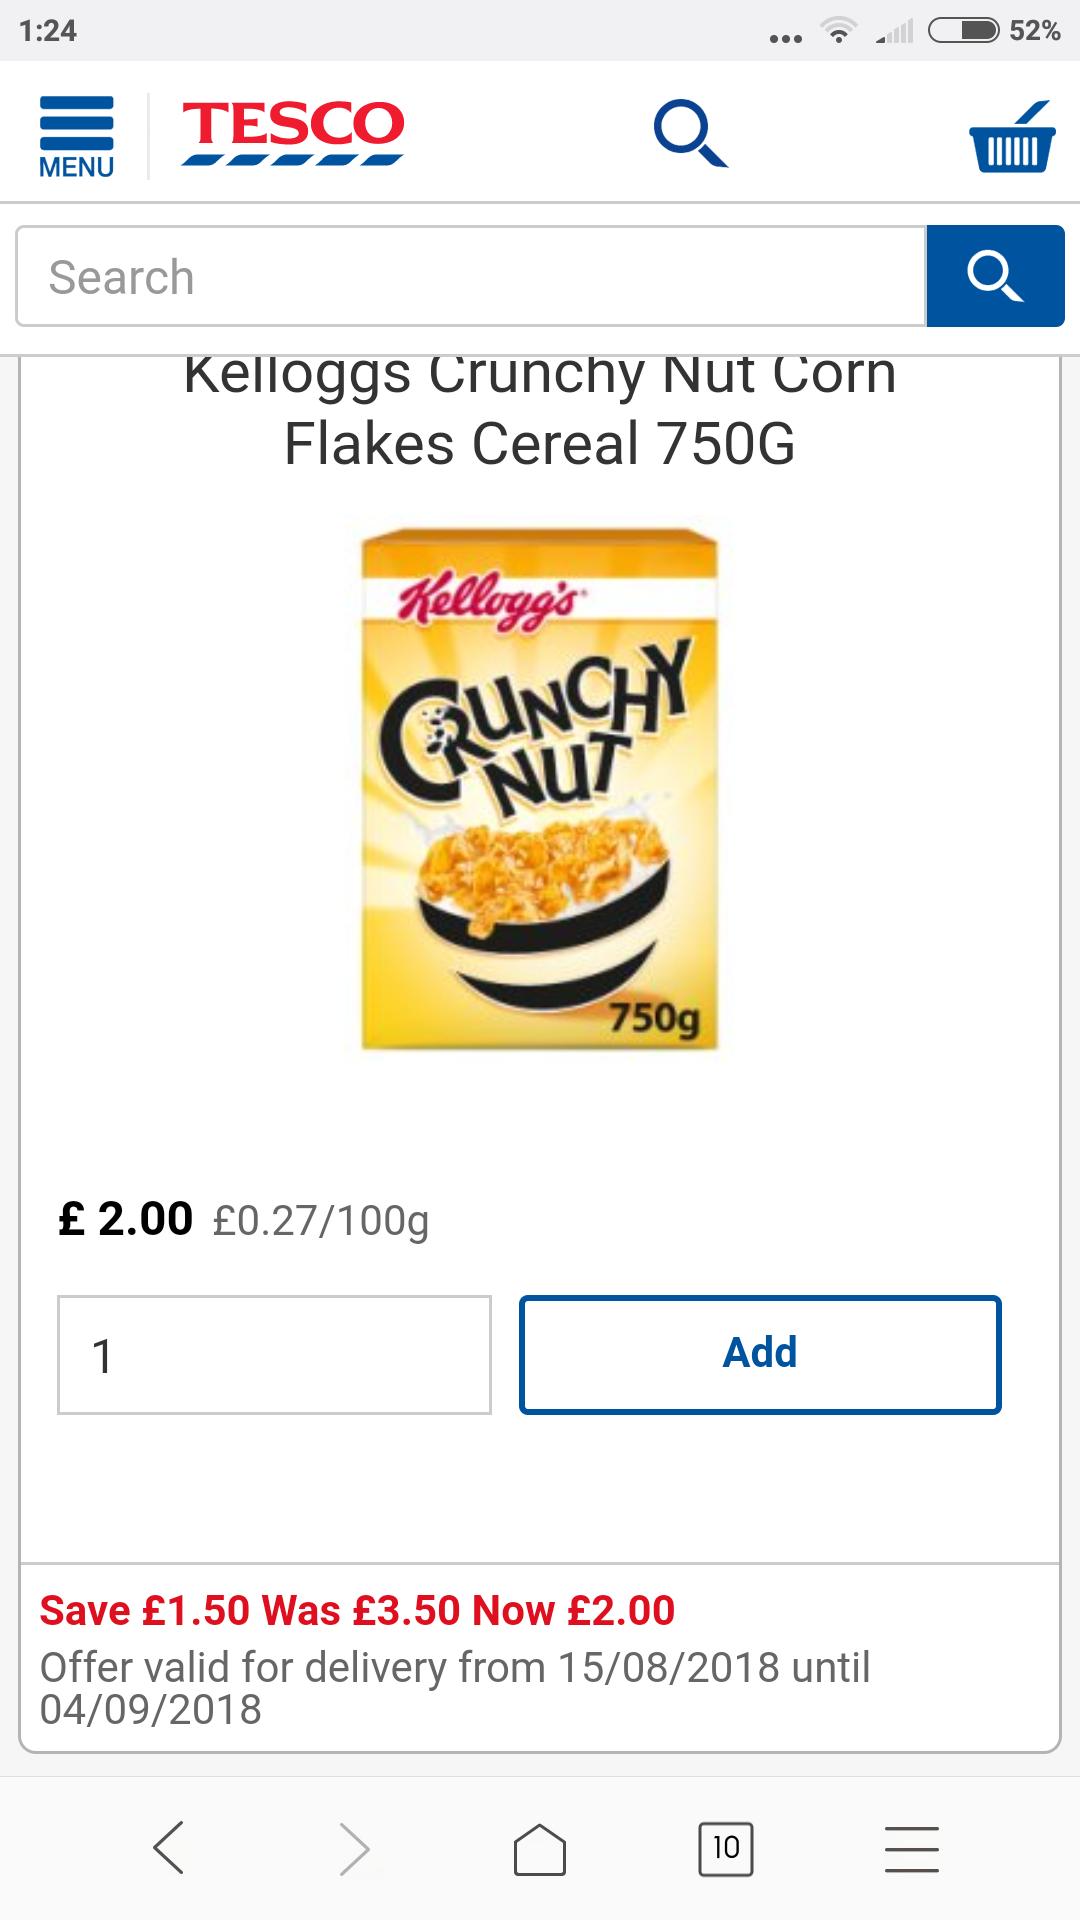 kelloggs crunchy nut cornflakes 750g,  tesco,  £2.00